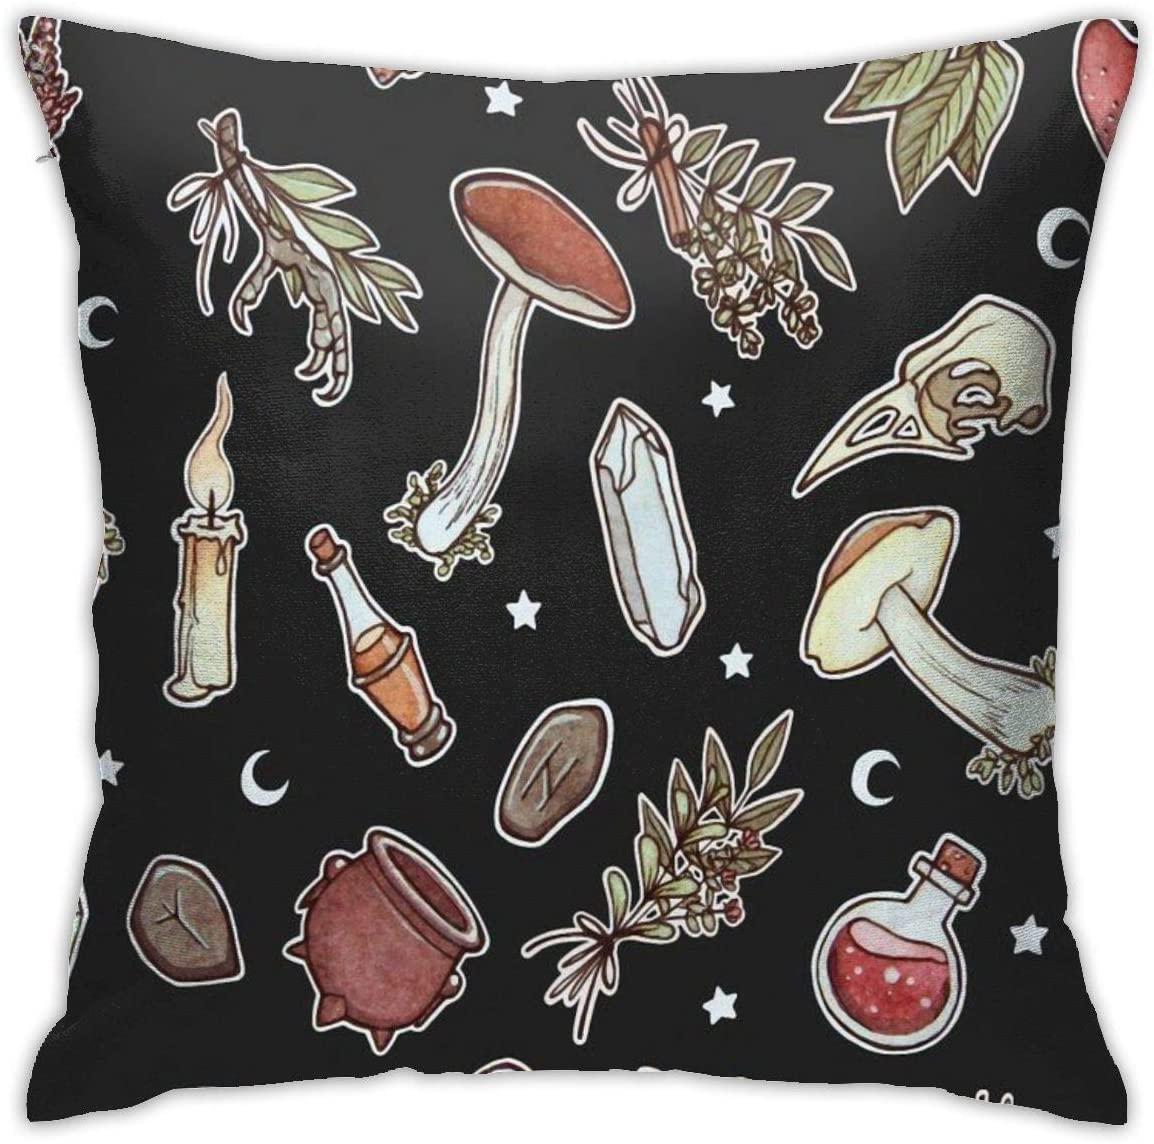 Witchy Pattern Dark Pillowcases, Floor Pillowcases, Pillowcases, Sofa Cushions, Cushion Covers, Backrest Covers, Car Cushion Interiors